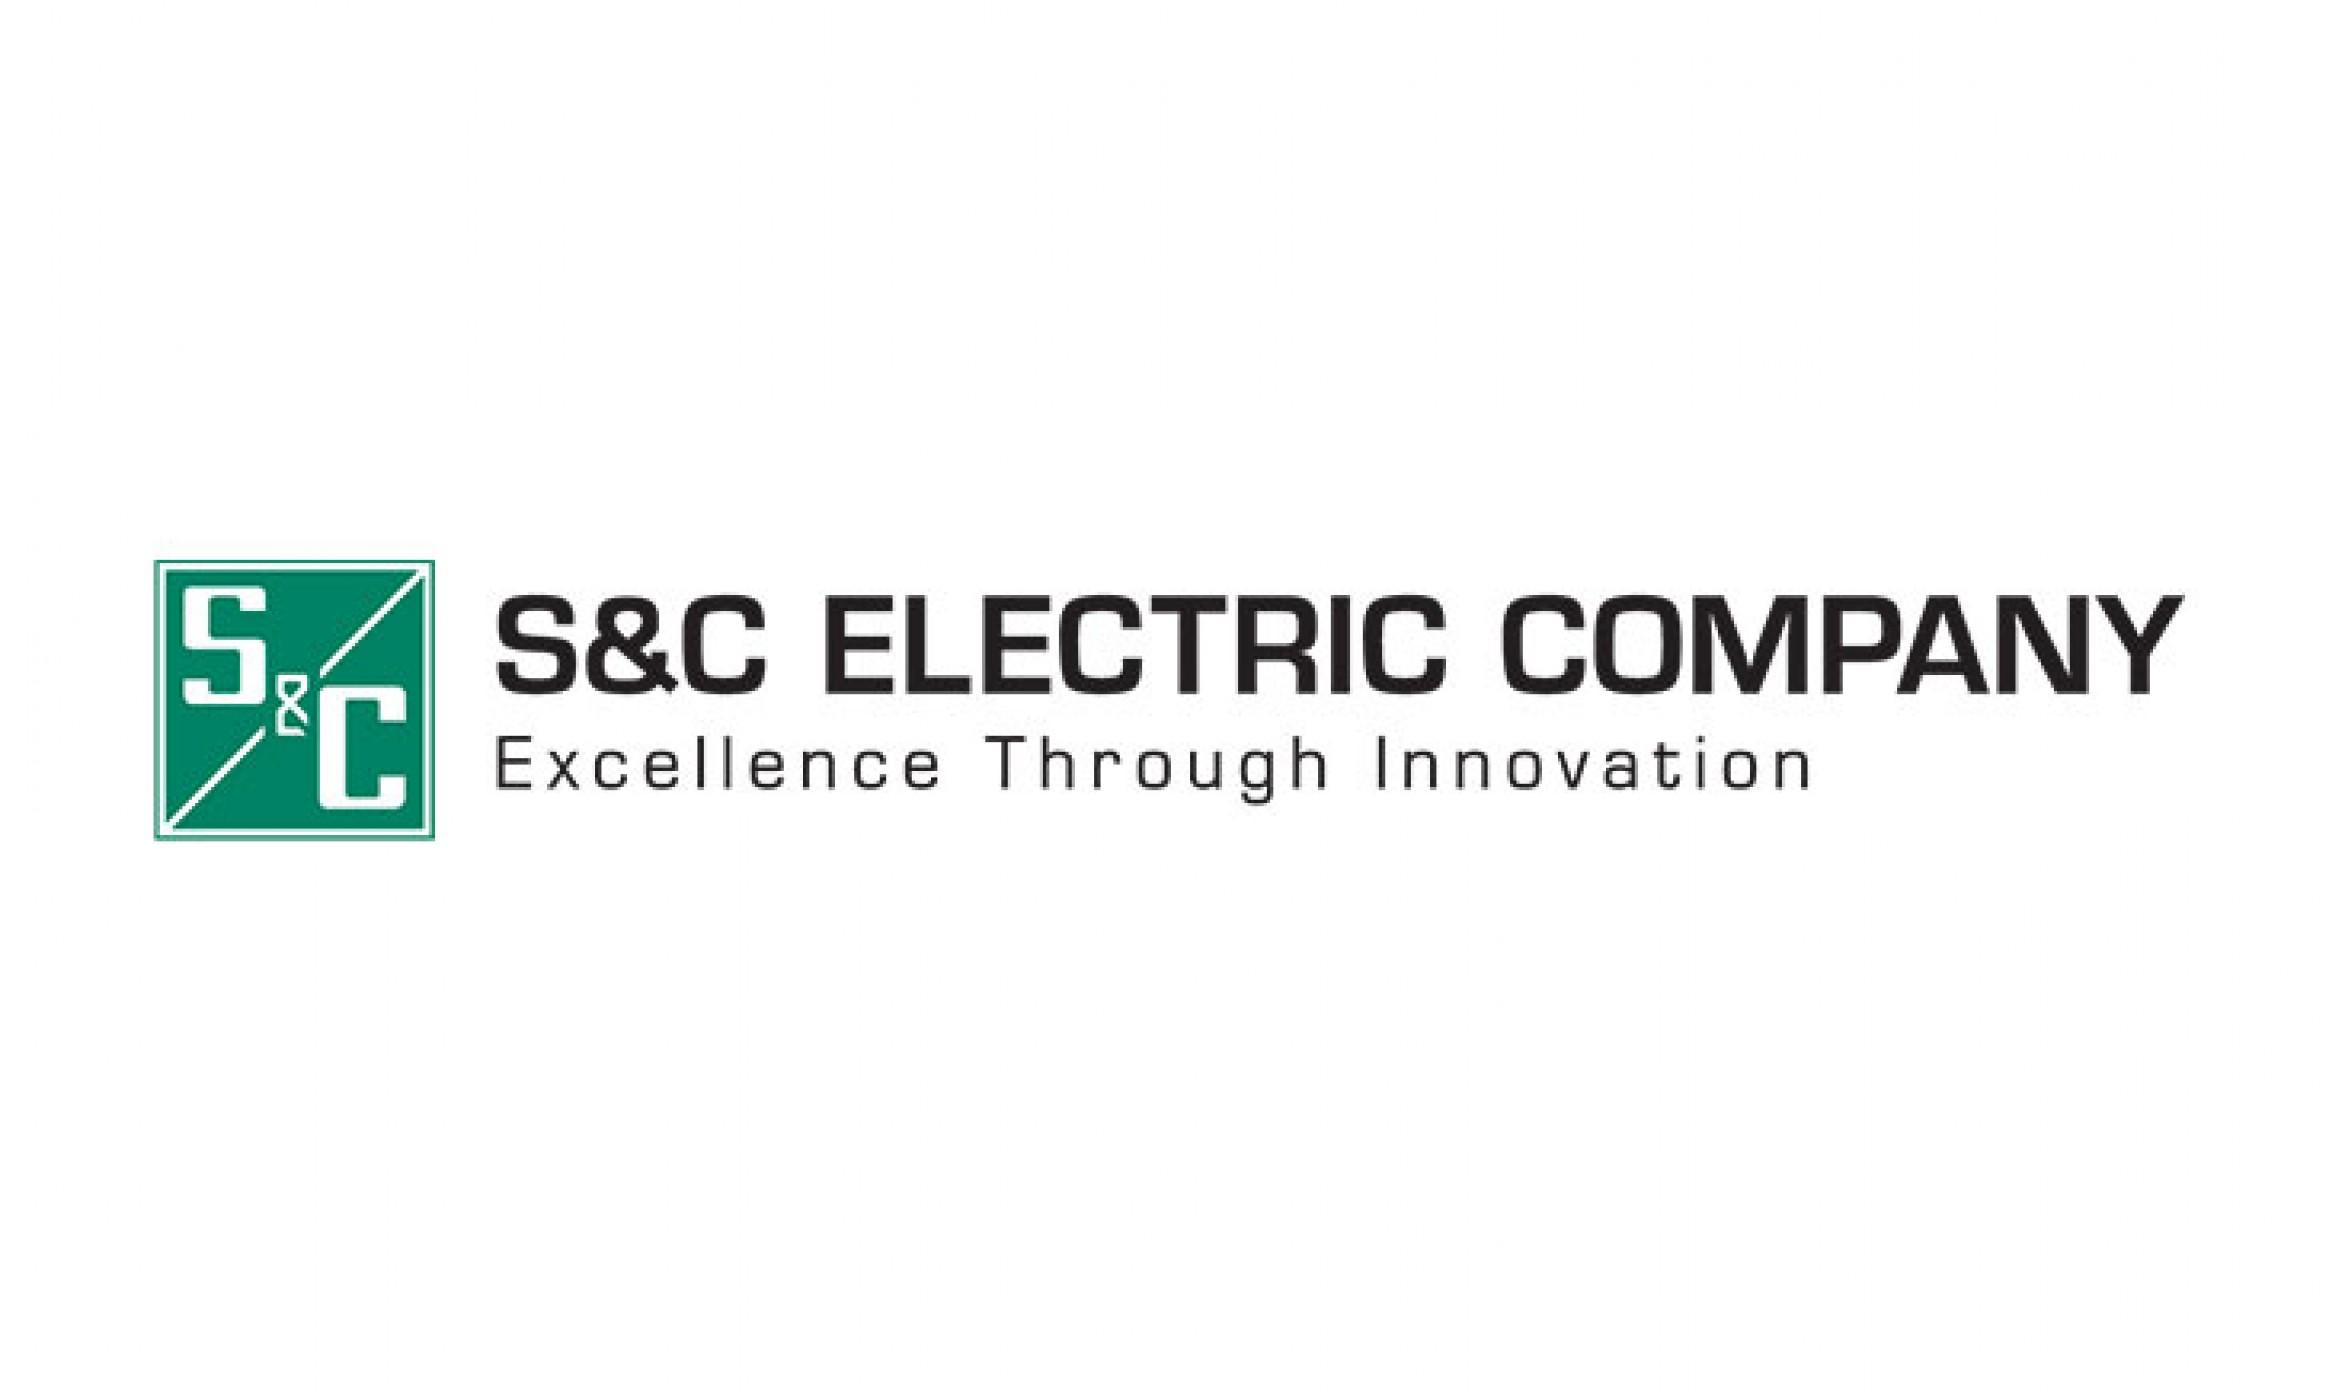 S&C Electric Company